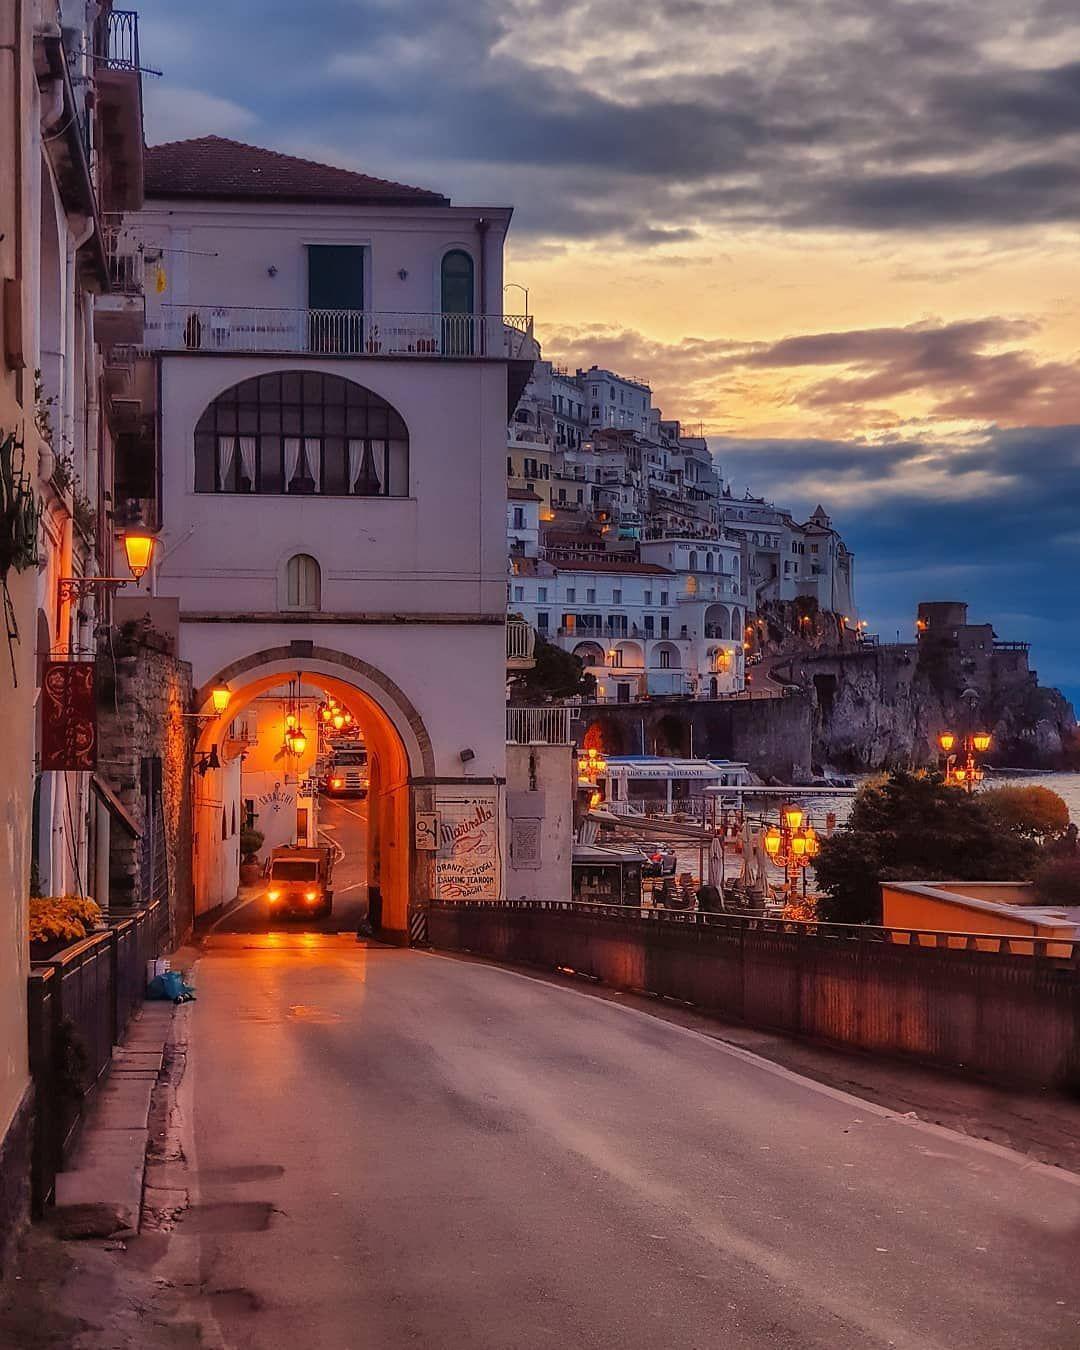 #amalfi #italia #instadaily #instalike #instagood #photooftheday #photography #tbt #trip #travel #amalfi #italia #instadaily #instalike #instagood #photooftheday #photography #tbt #trip #travel #pic #vacation #feliz #amor #love #happy #follow #followme #selfie #cute #gratidão #beautiful #instamood #yolo #smile #picoftheday #experience #life #klassboulevard #klassblvd (: @gennaro_rispoli)